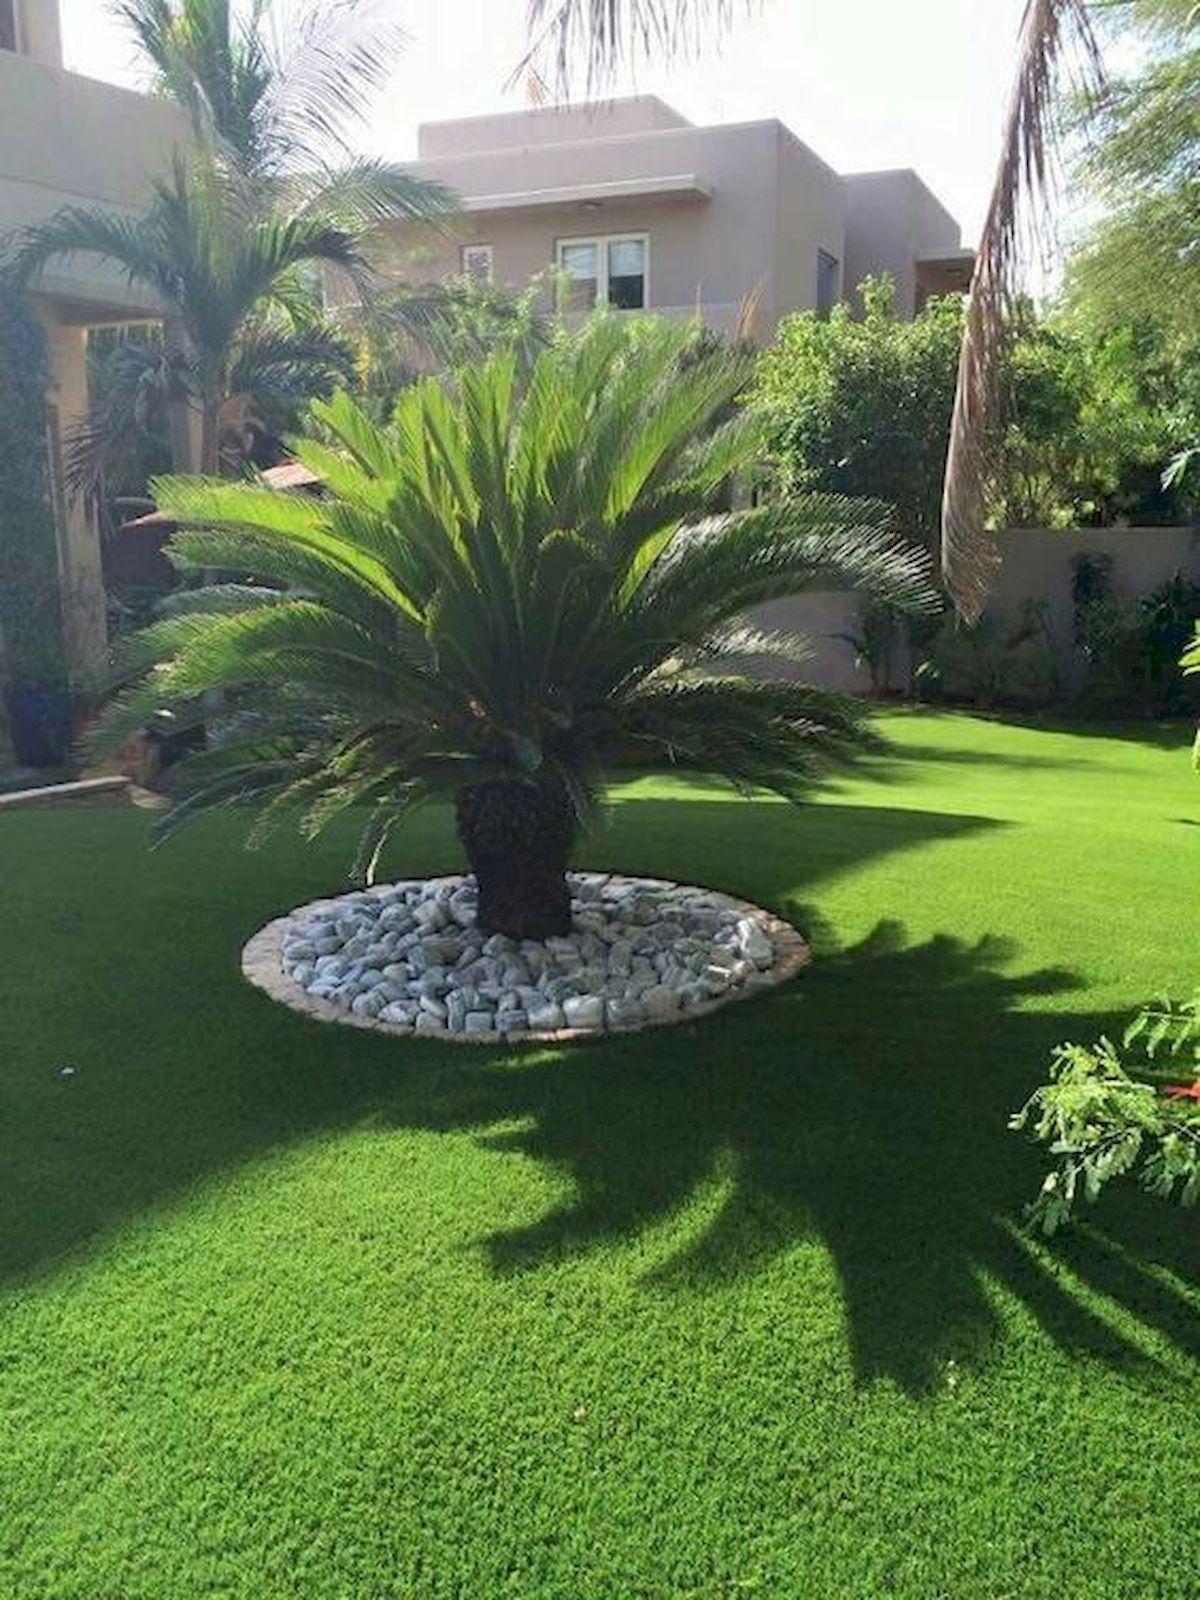 90 Beautiful Backyard Garden Design Ideas For Summer 68 Worldecor Co Design Jardin Jardin En Gravier Decoration Jardin Exterieur